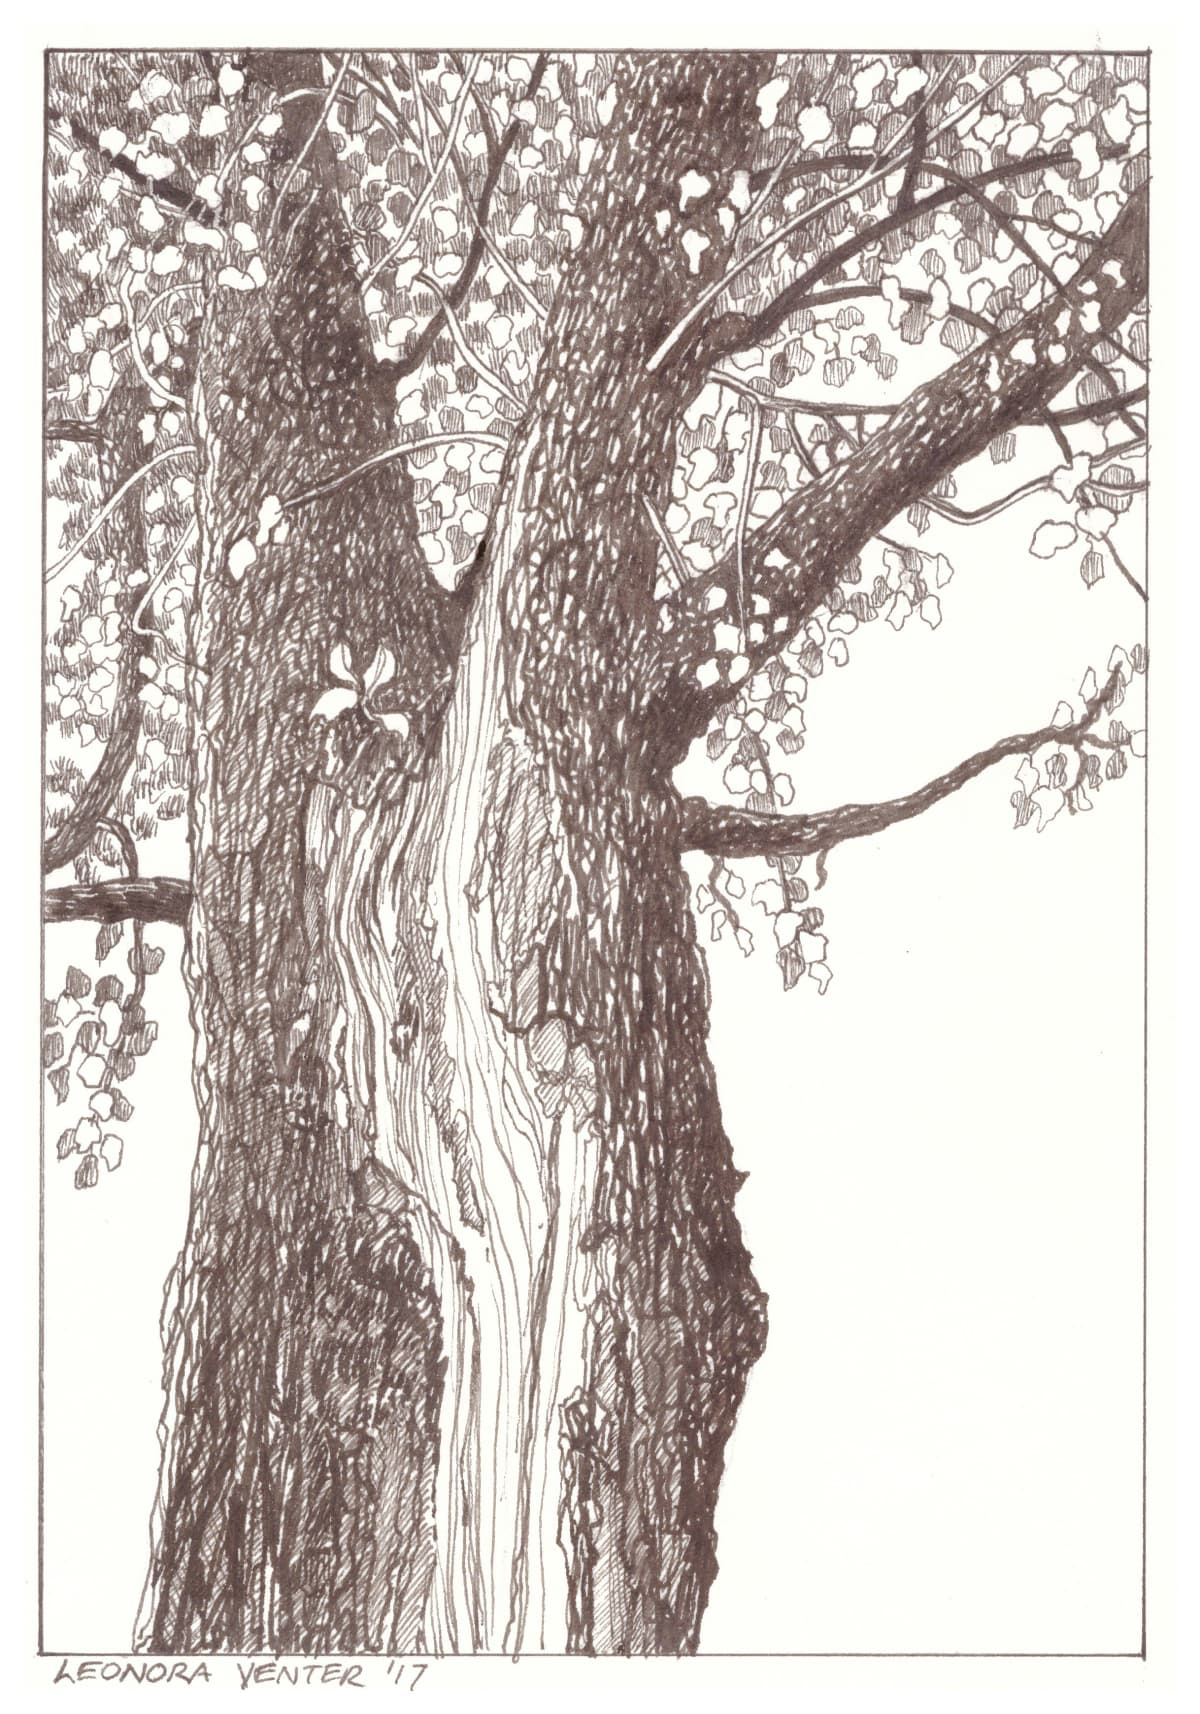 Leonora Venter, Tree, 2017